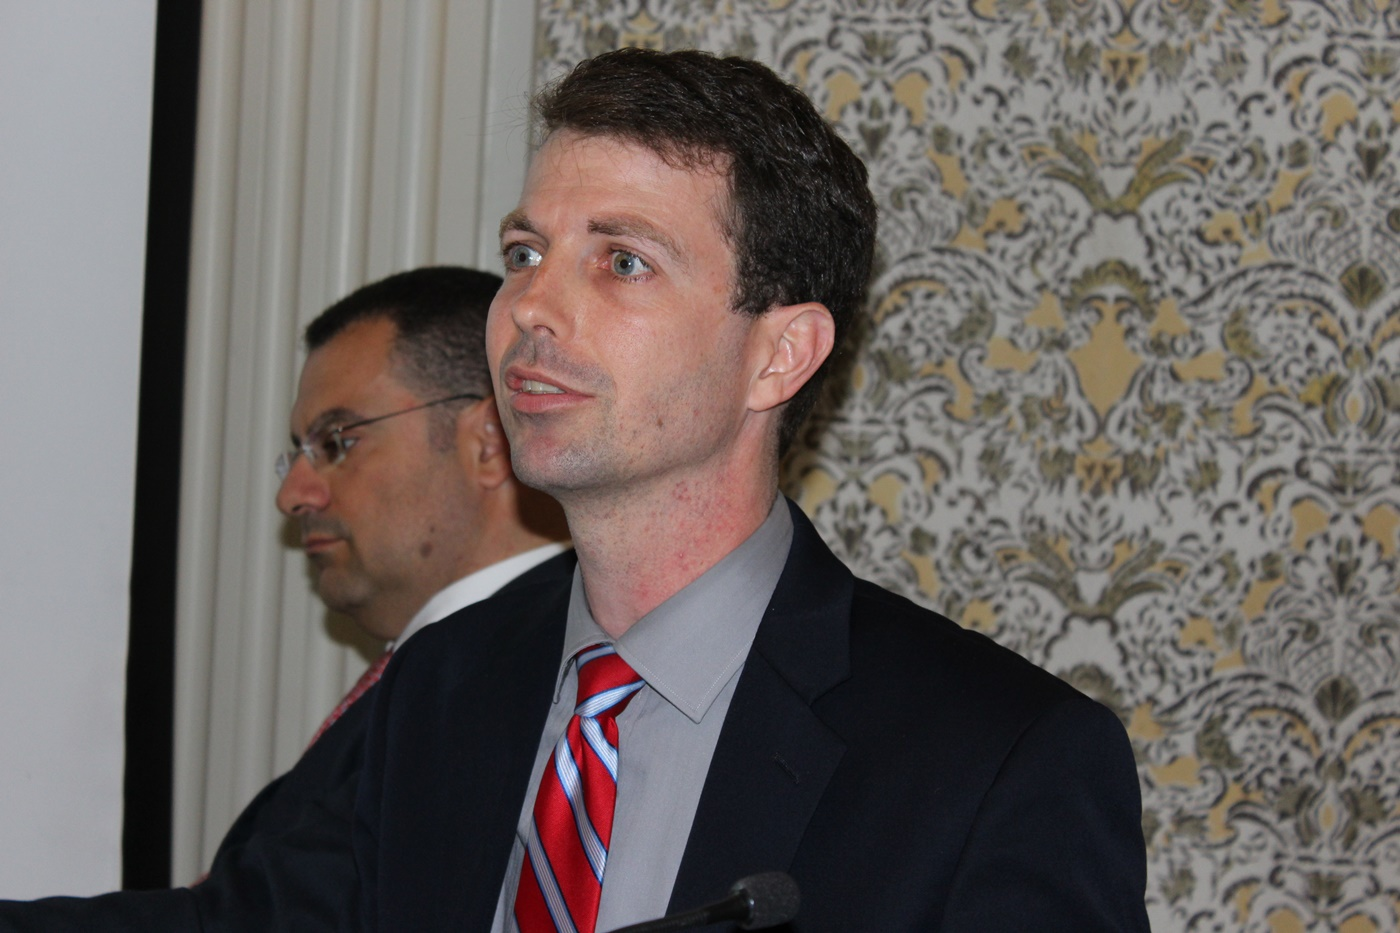 Paul J. Tortora